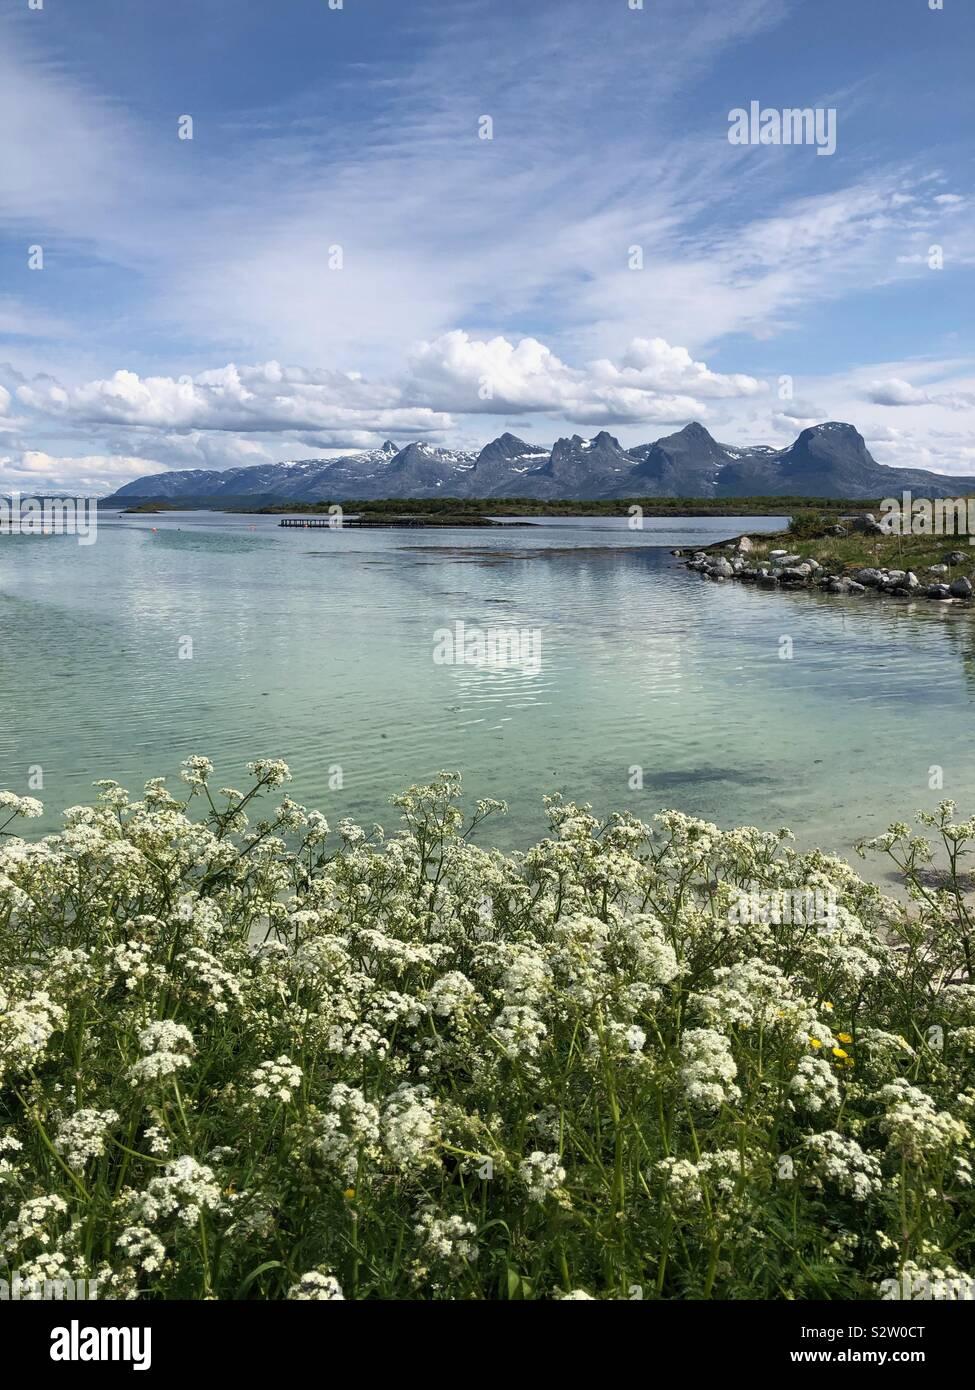 Las siete hermanas cordillera a Isla Heroy, Noruega. Foto de stock